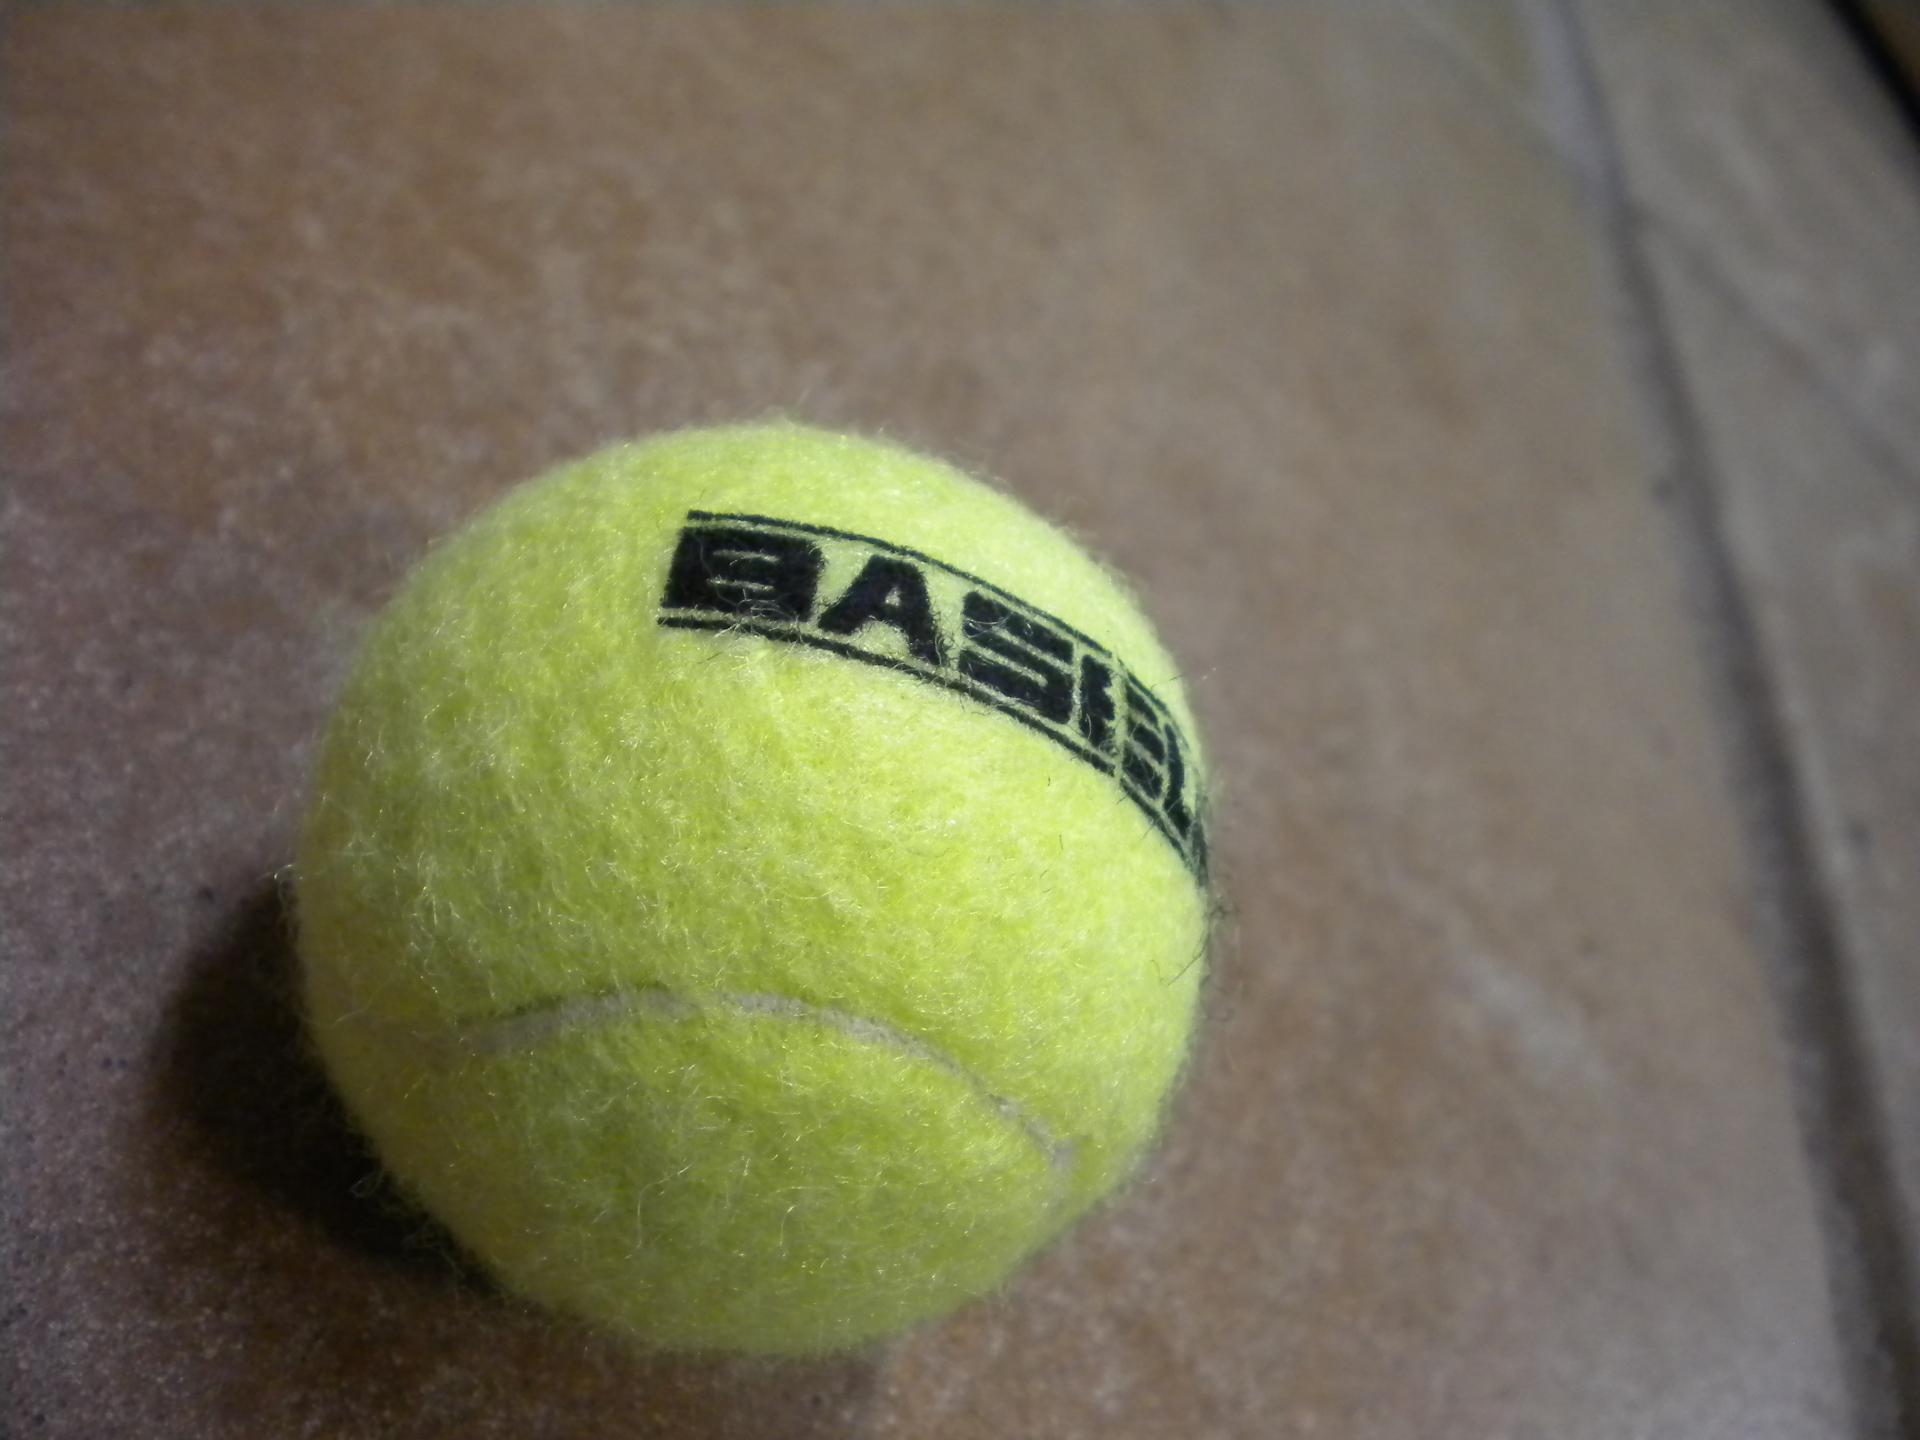 Balls and more balls